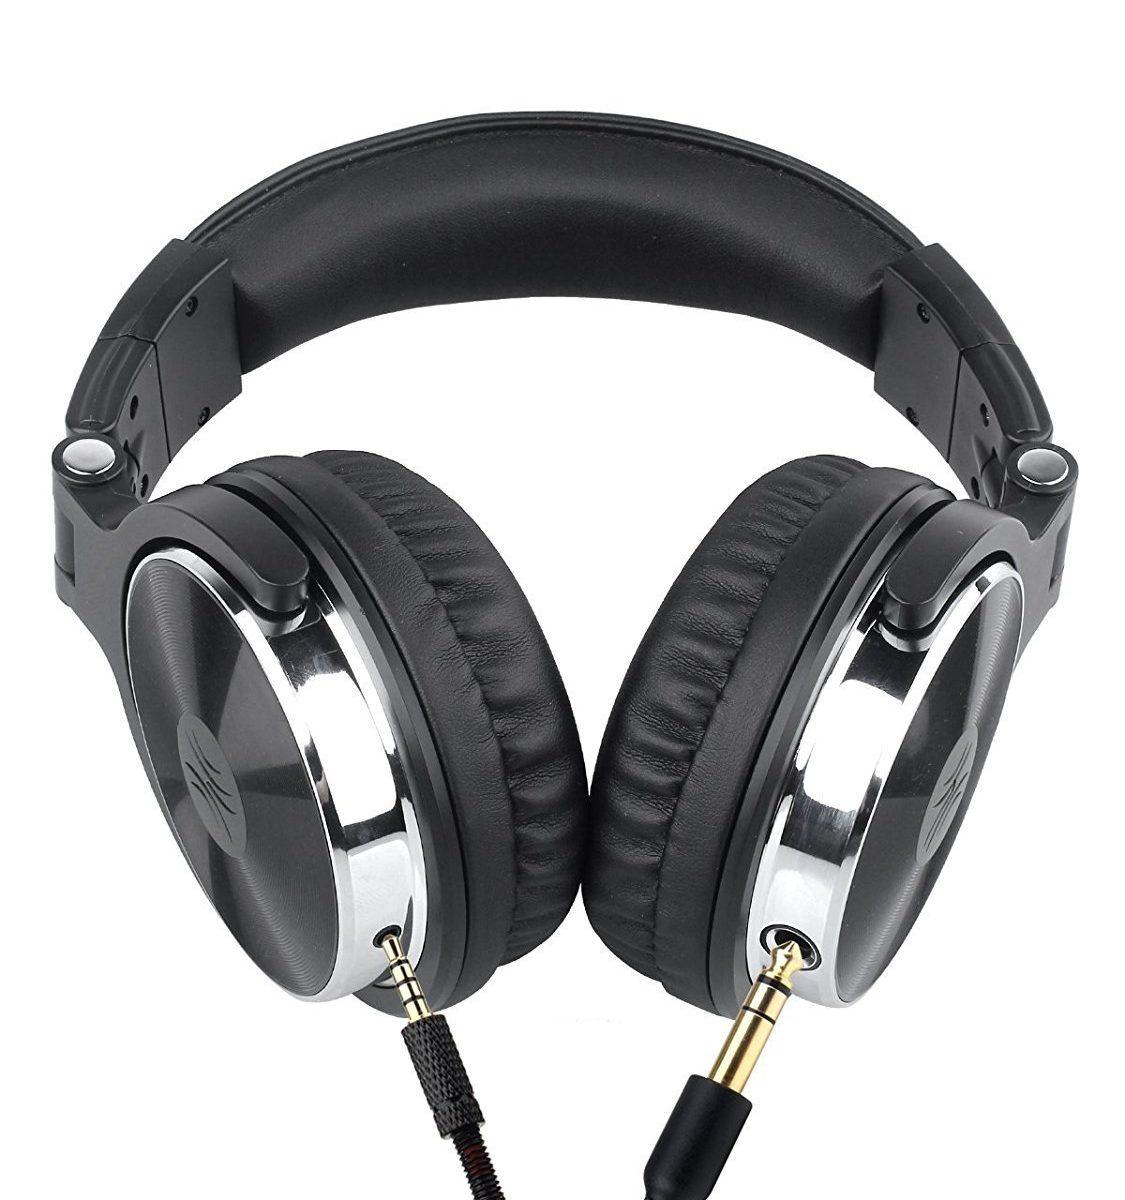 OneOdio DJ-Kopfhörer und Studiokopfhörer